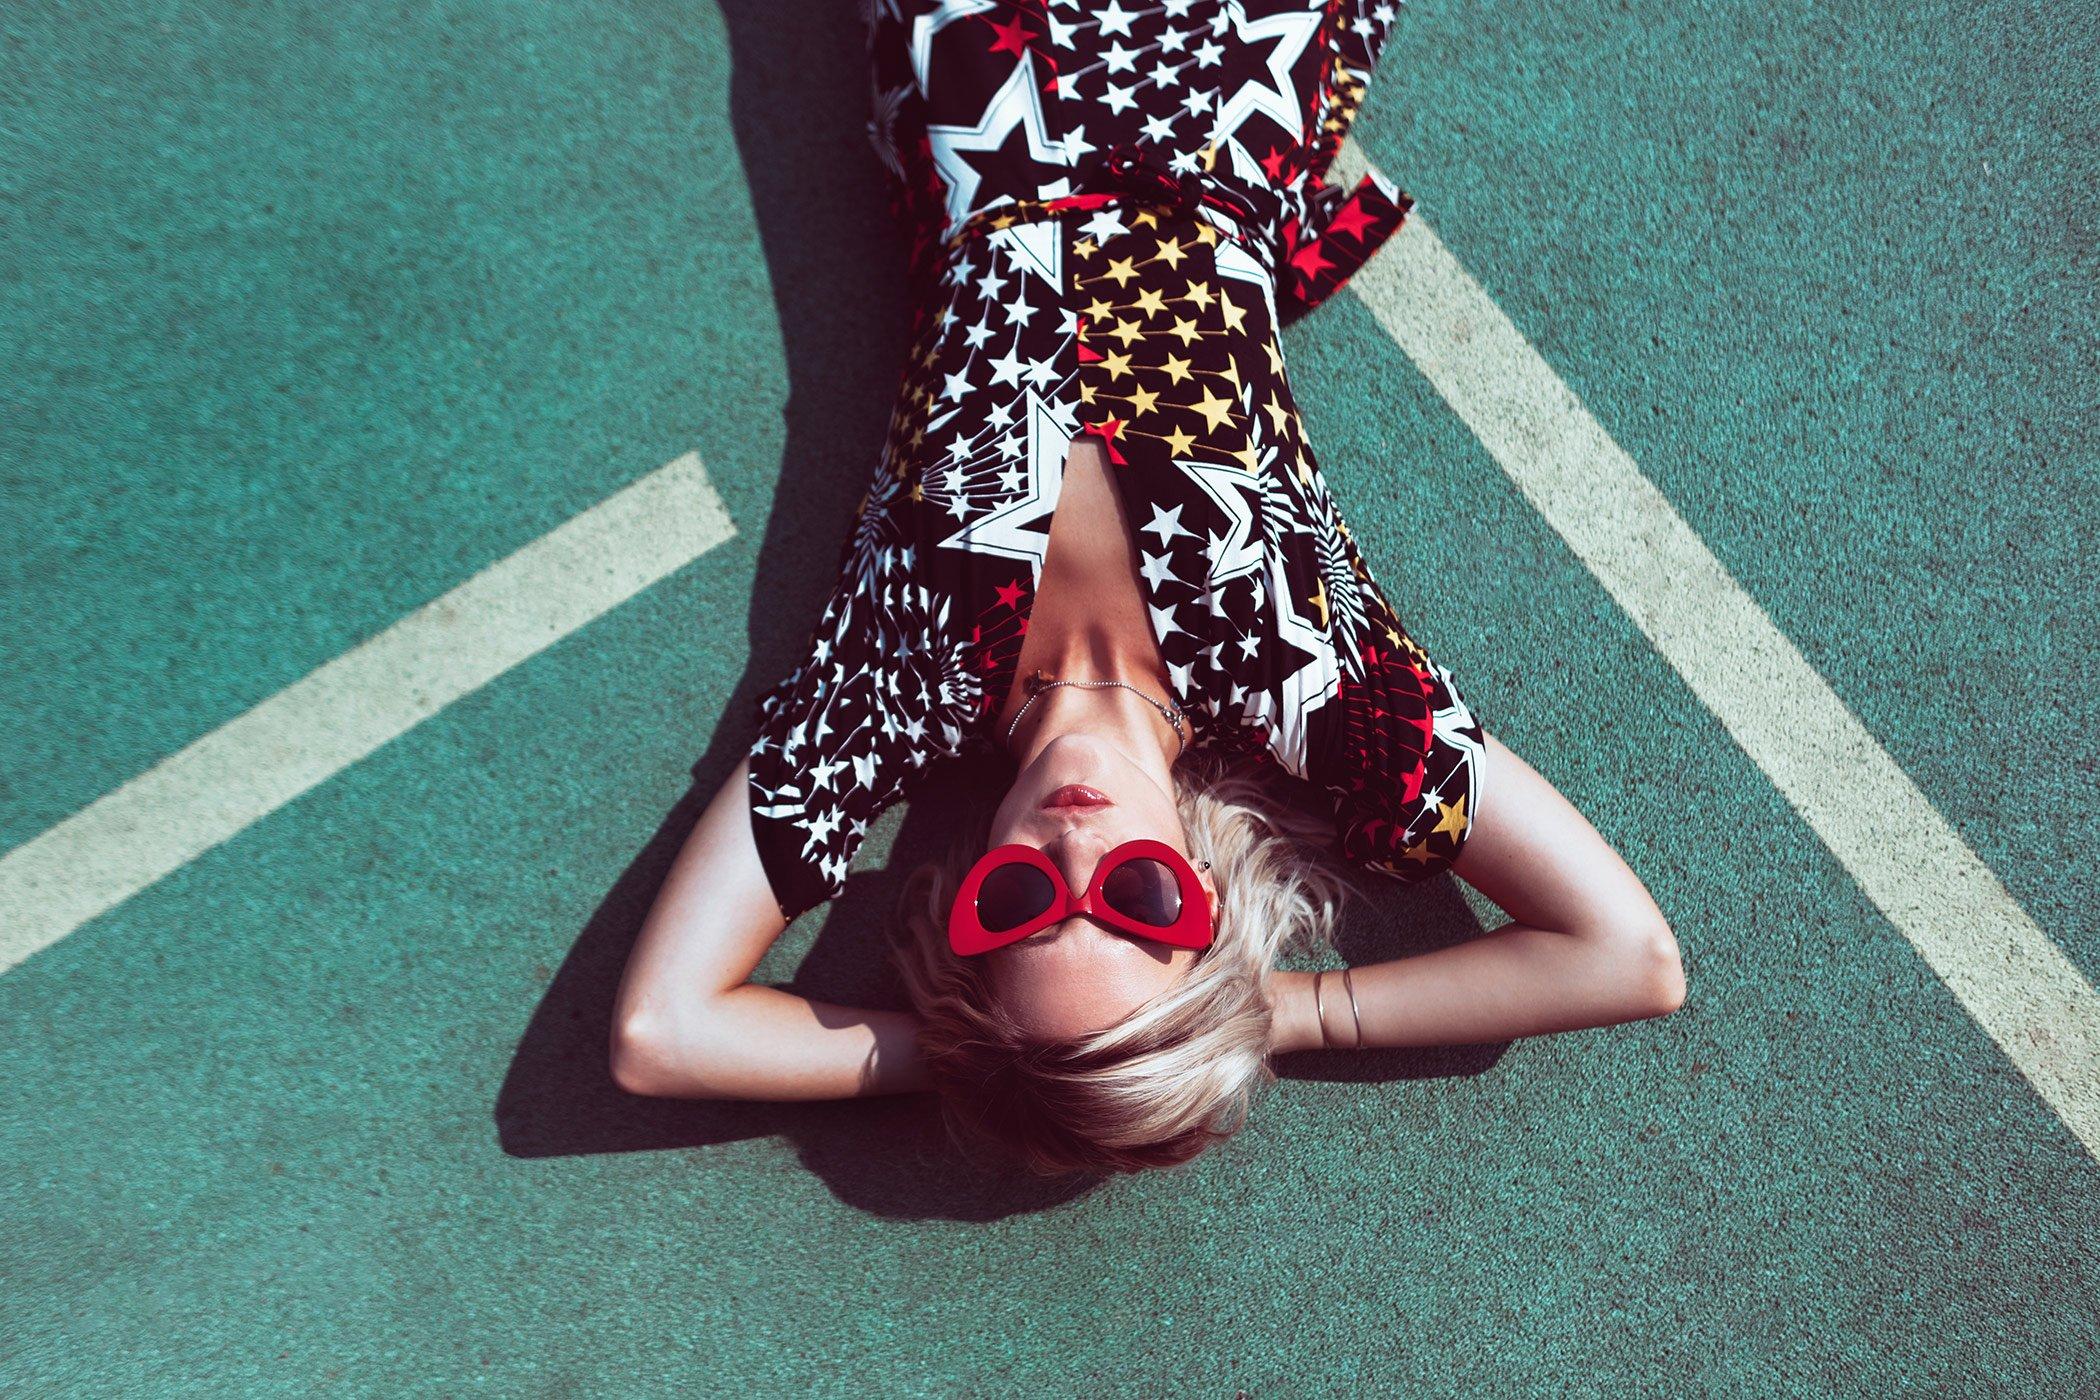 mikuta-star-dress-and-red-cat-eye-sunglasses-8